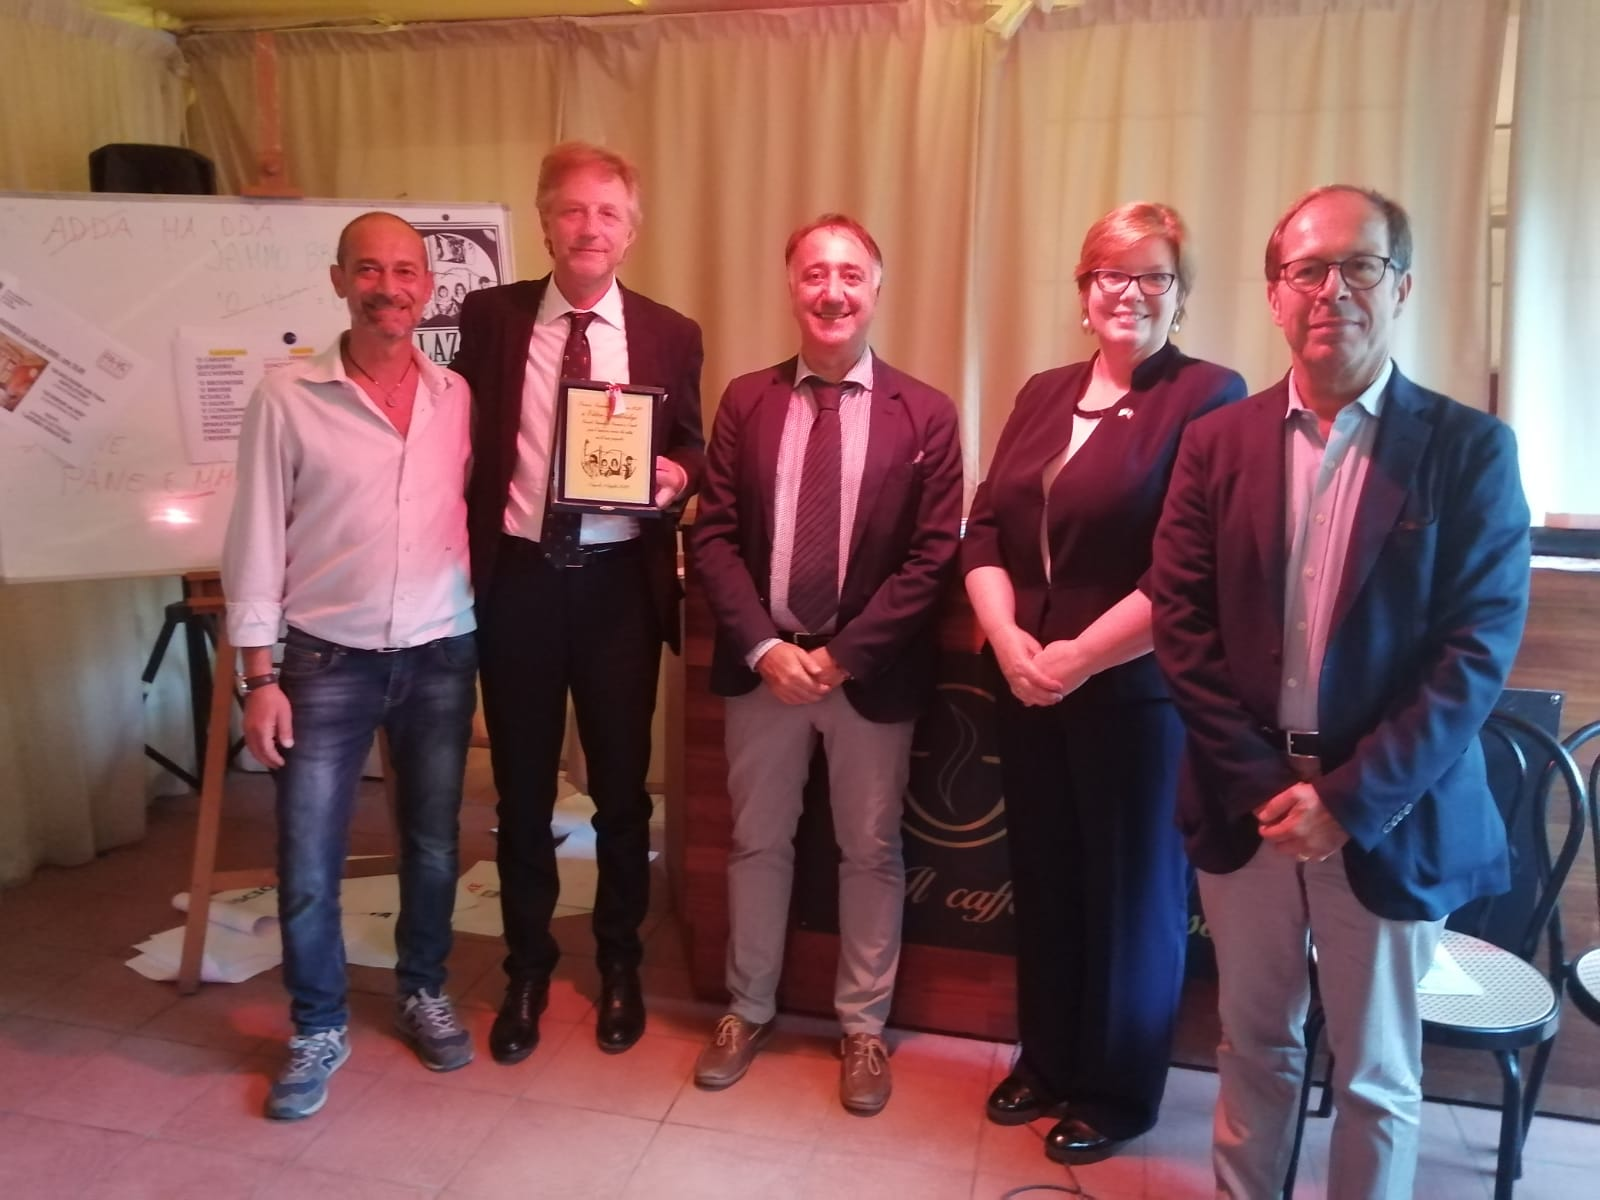 Dr. Viktor Hamotskyi, General Consul of Ukraine awarded with Lazzaro Verace Prize 2020.